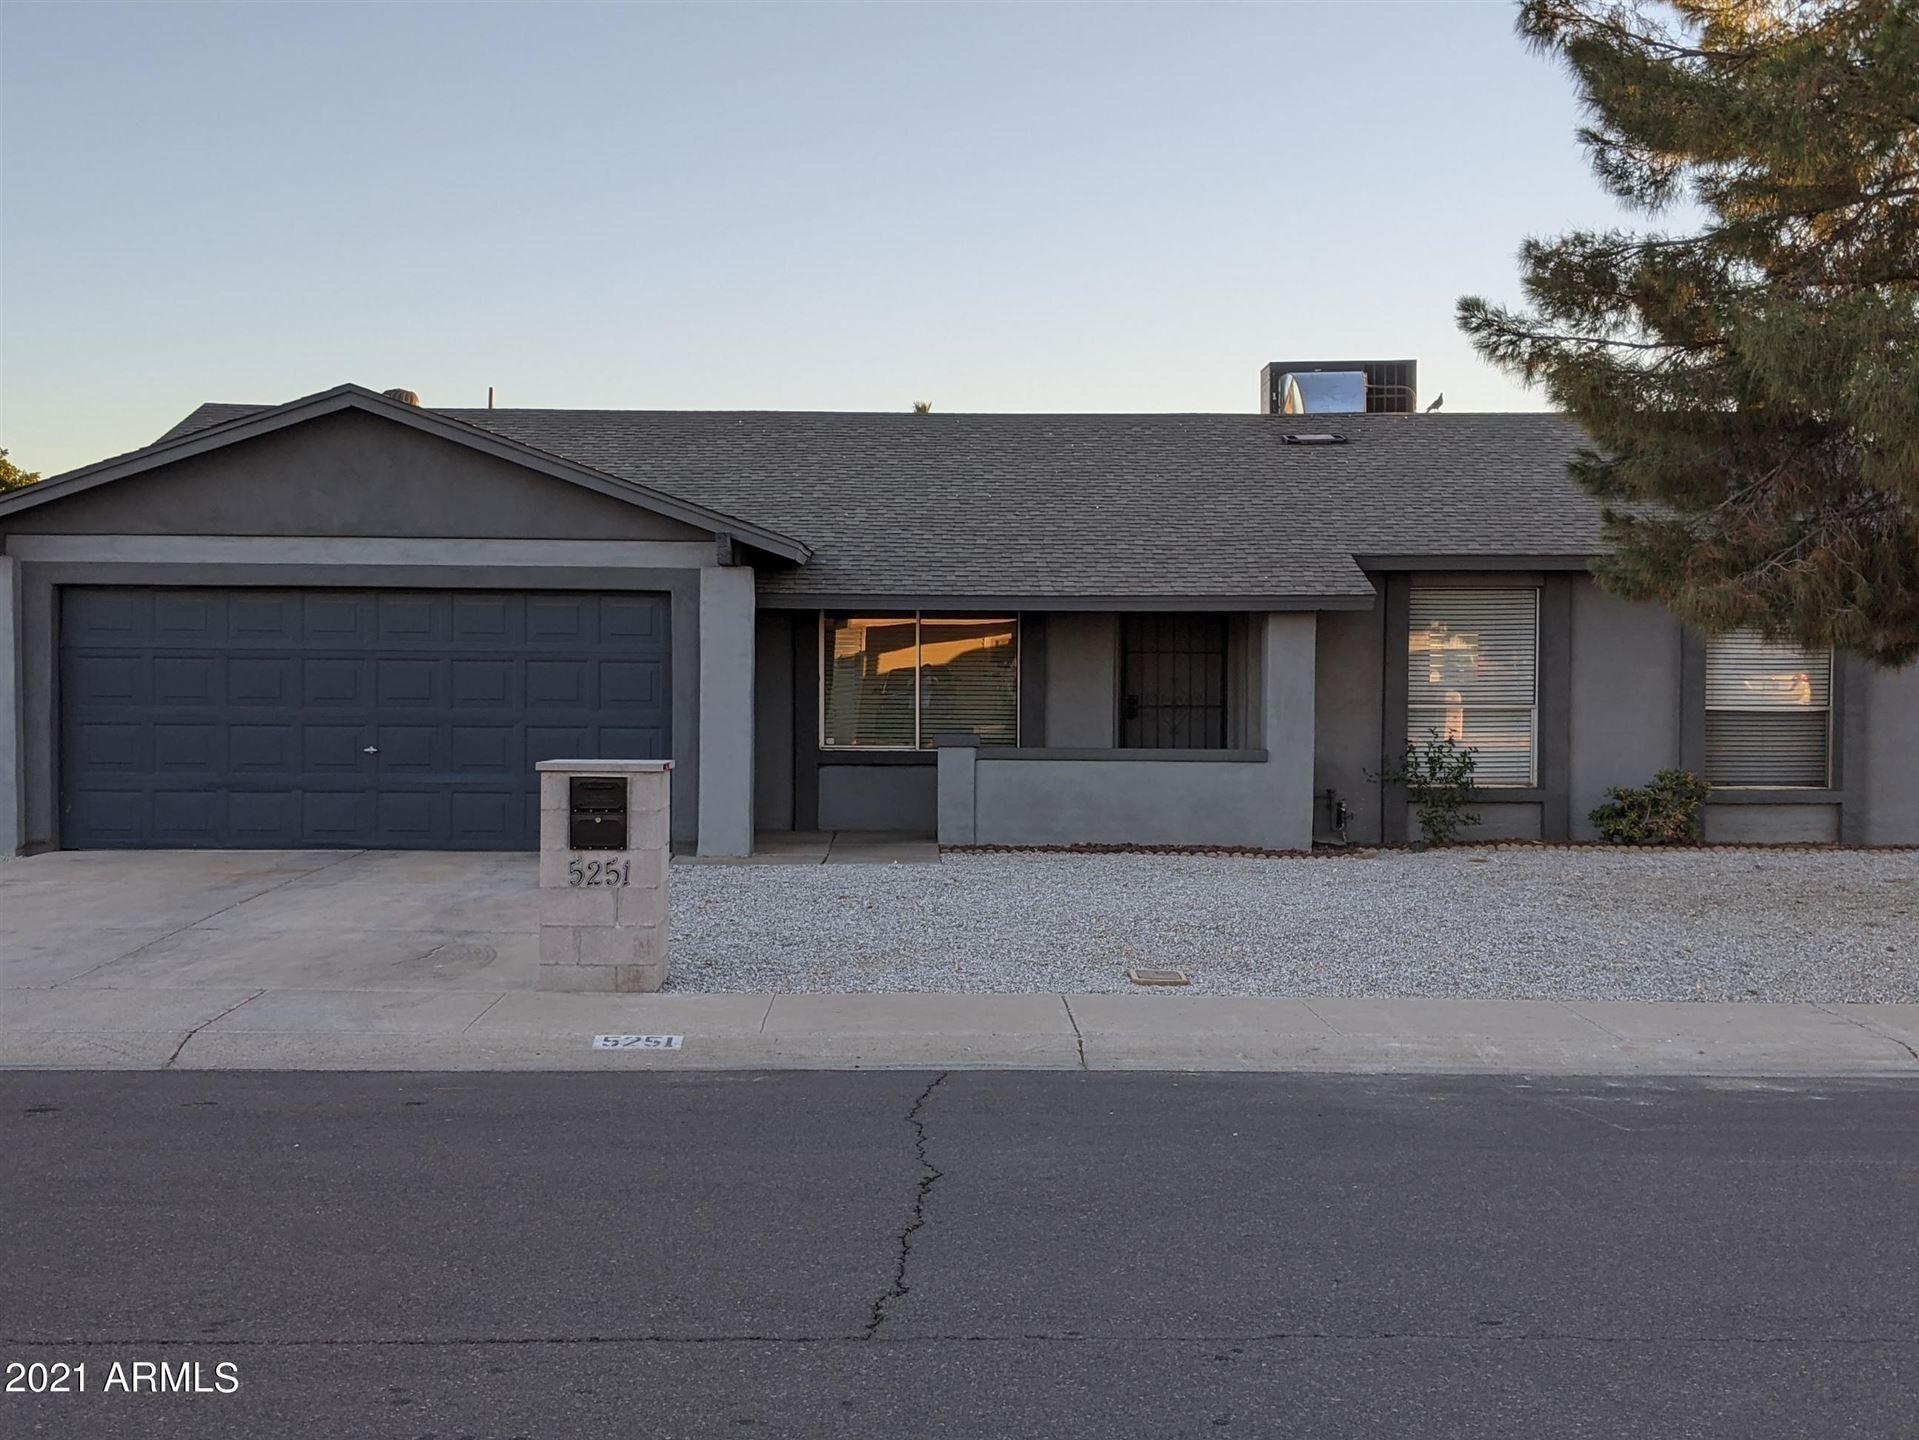 5251 W CORTEZ Street, Glendale, AZ 85304 - MLS#: 6181436